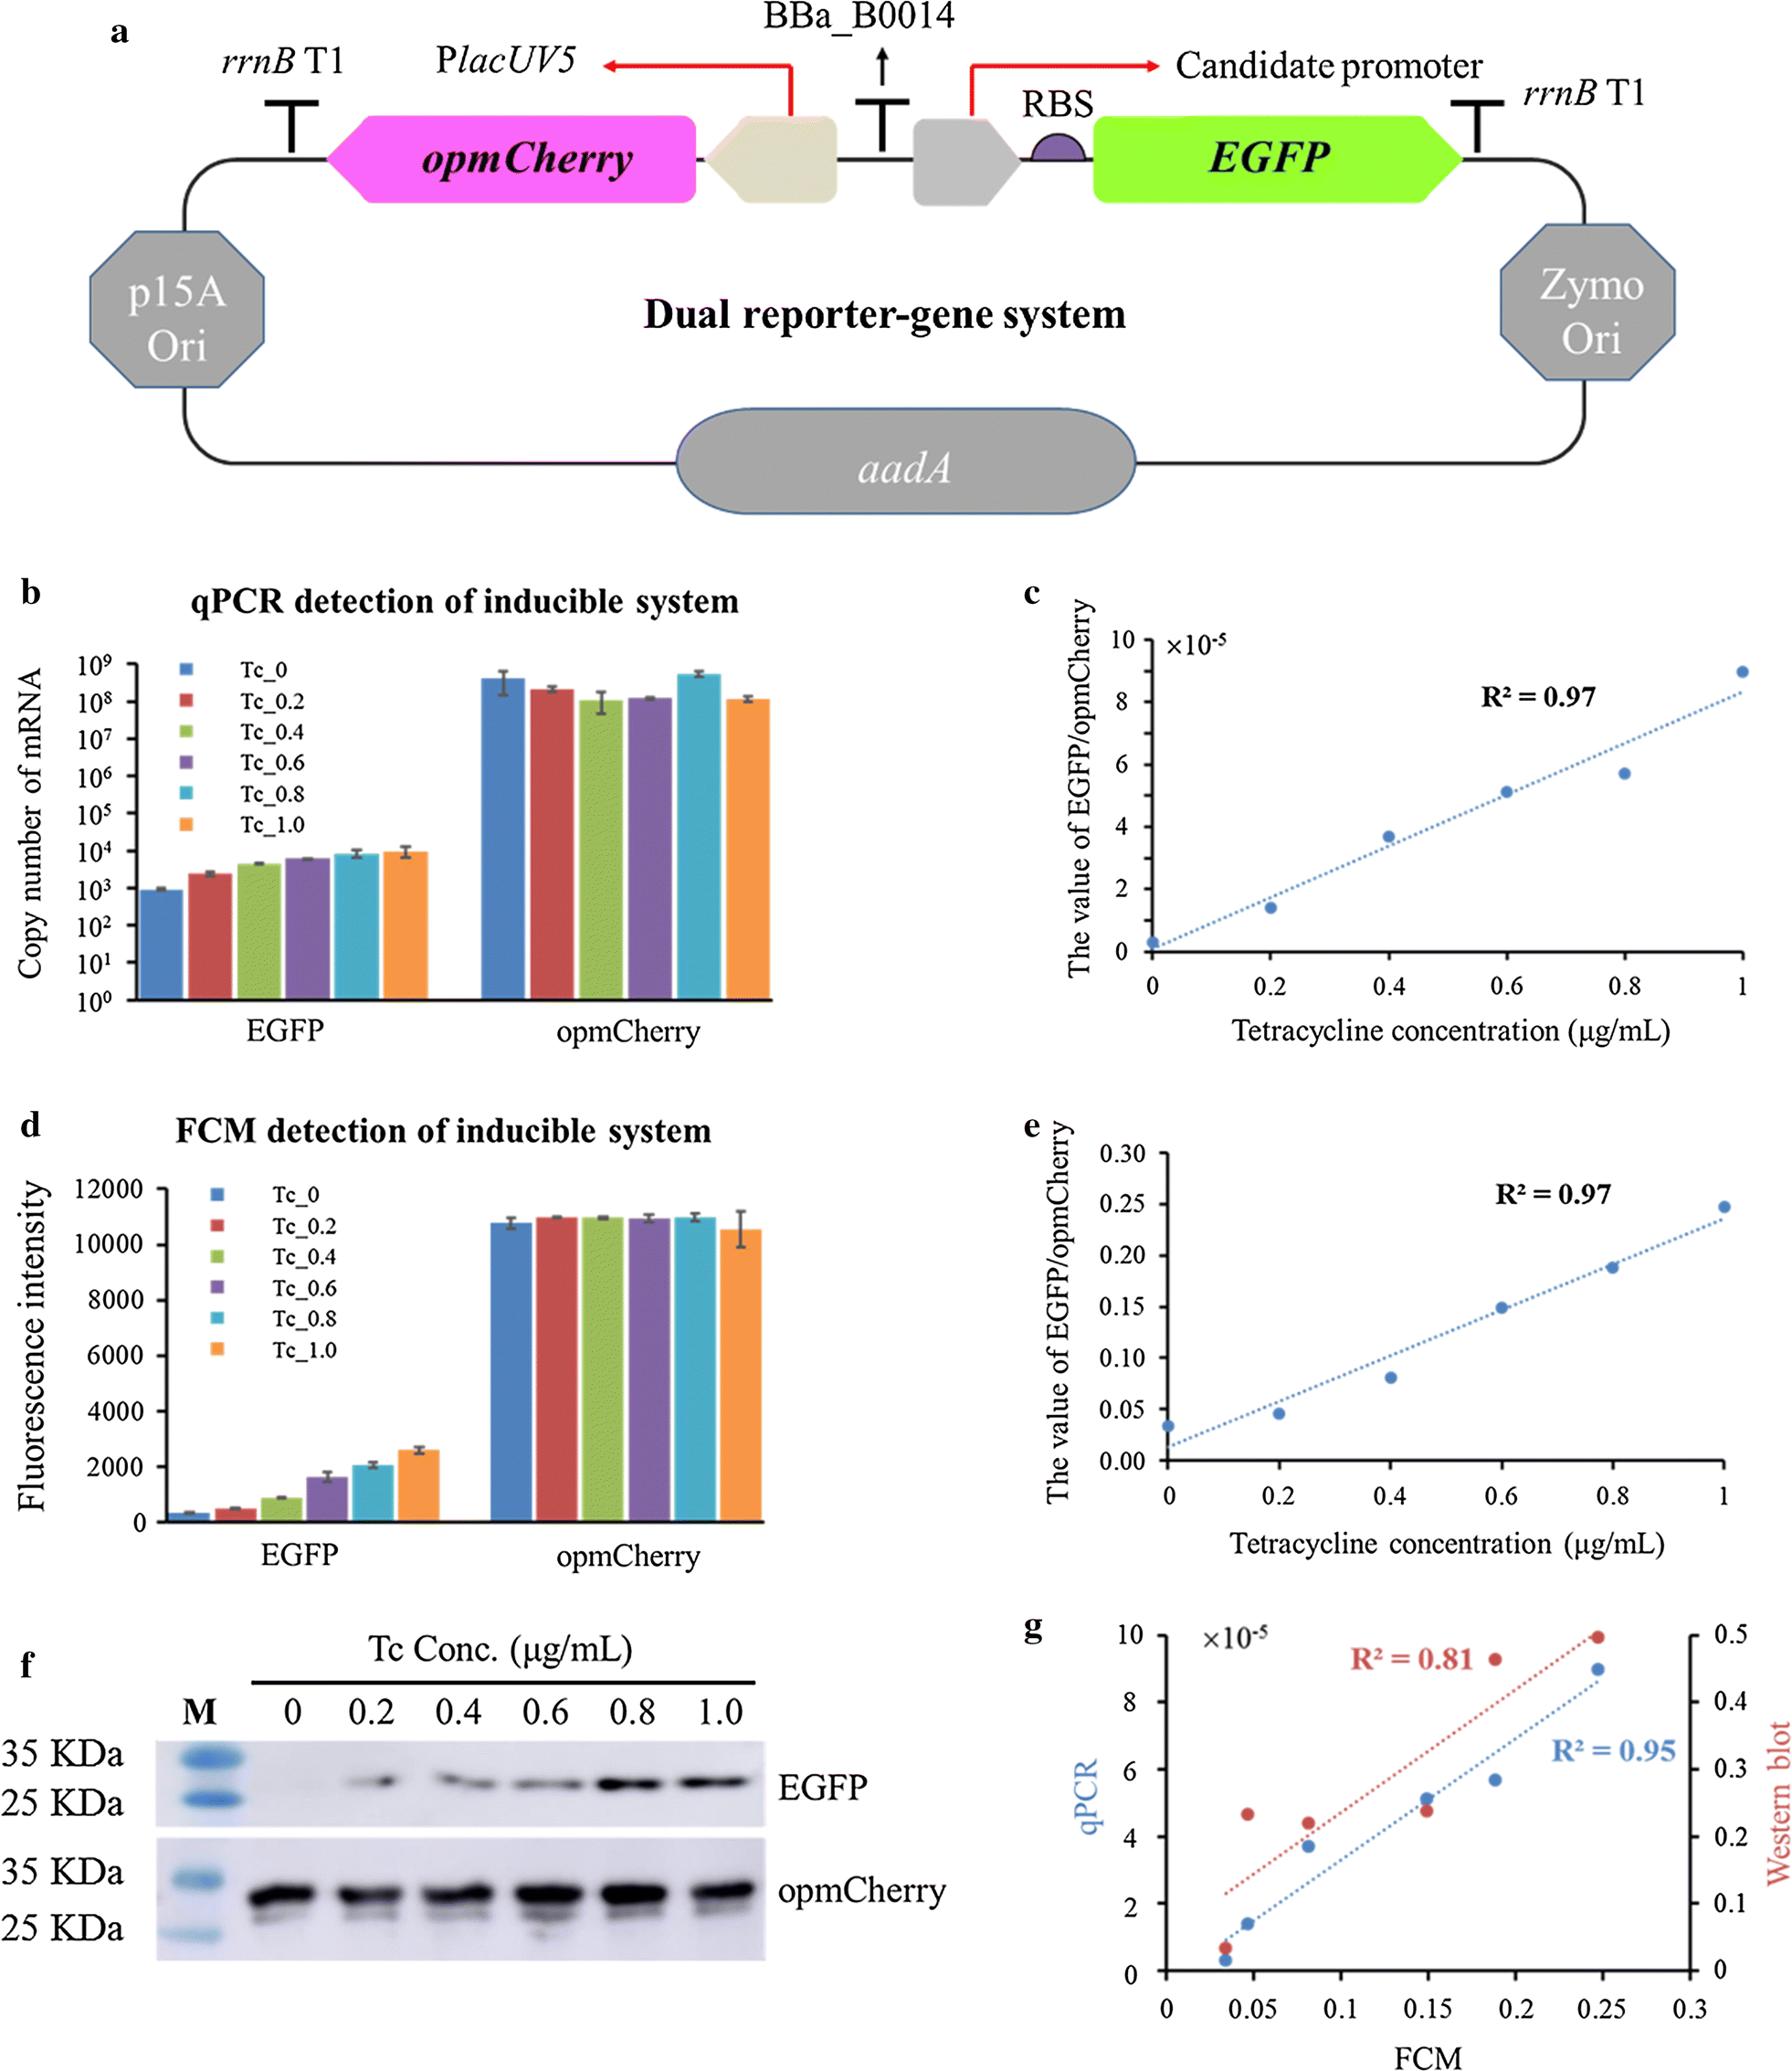 Prediction and characterization of promoters and ribosomal binding